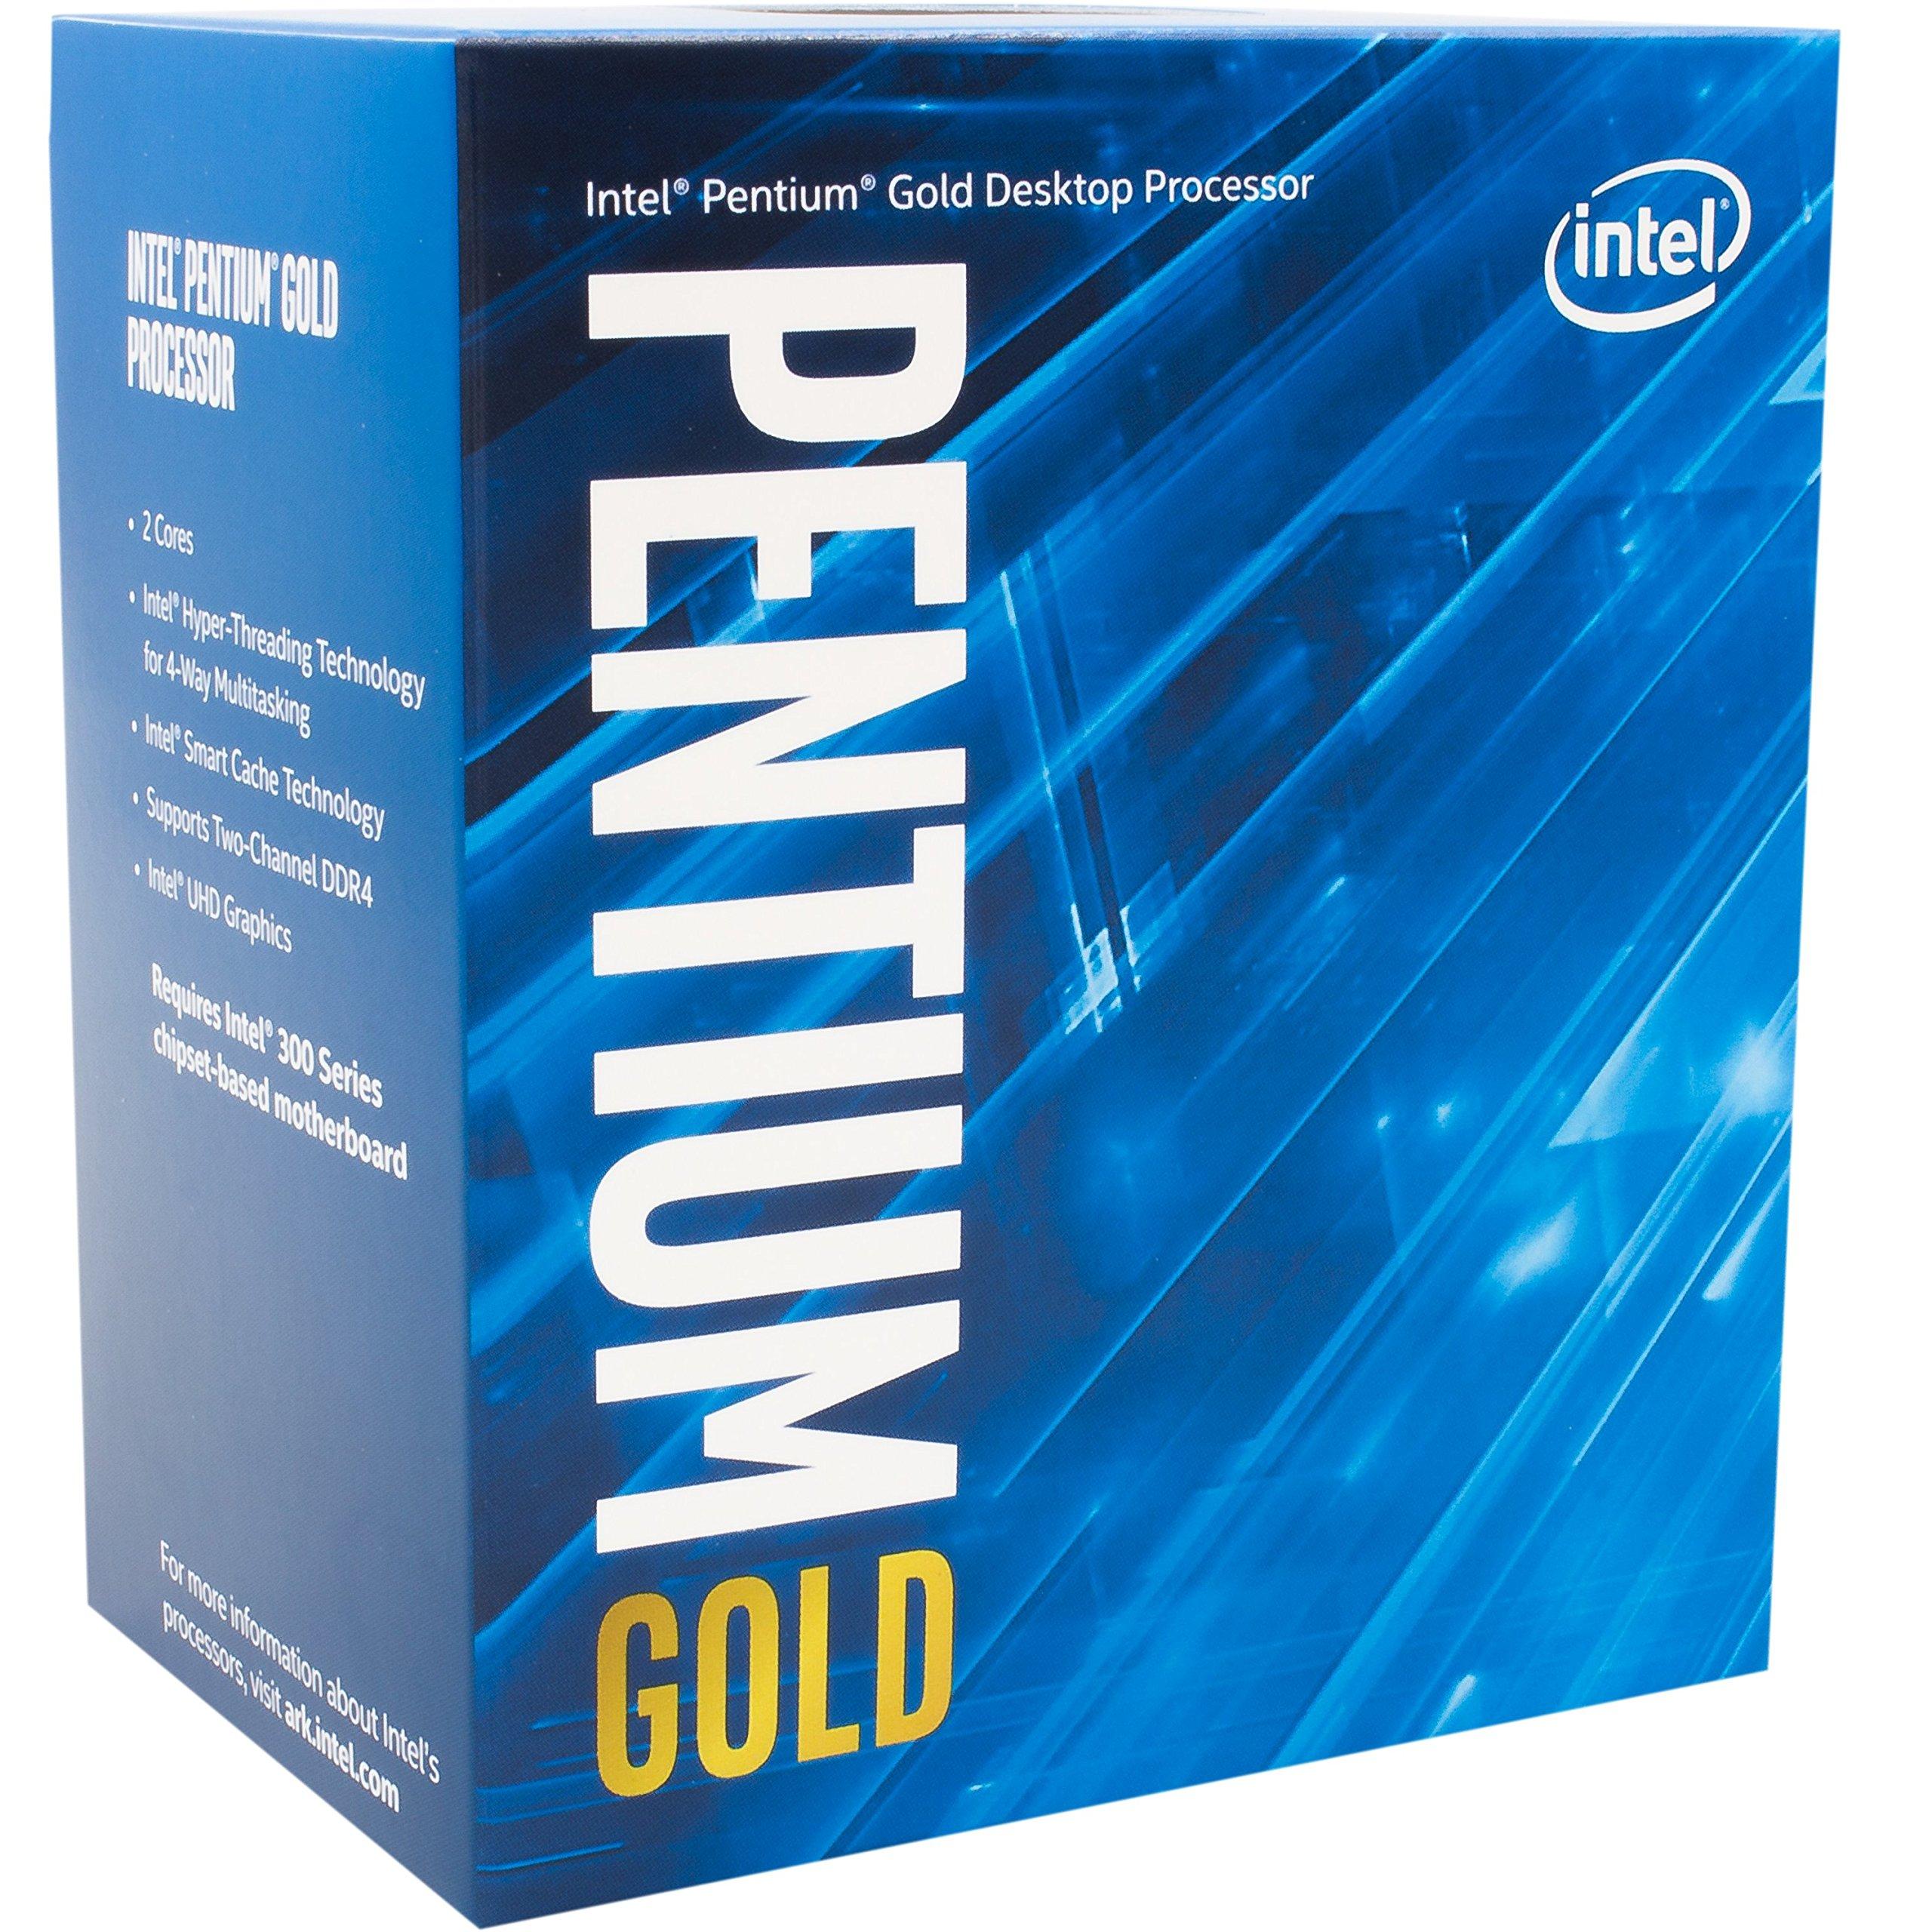 Intel Pentium Gold G5600 Desktop Processor 2 Core 3.9GHz LGA1151 300 Series 54W BX80684G5600 by Intel